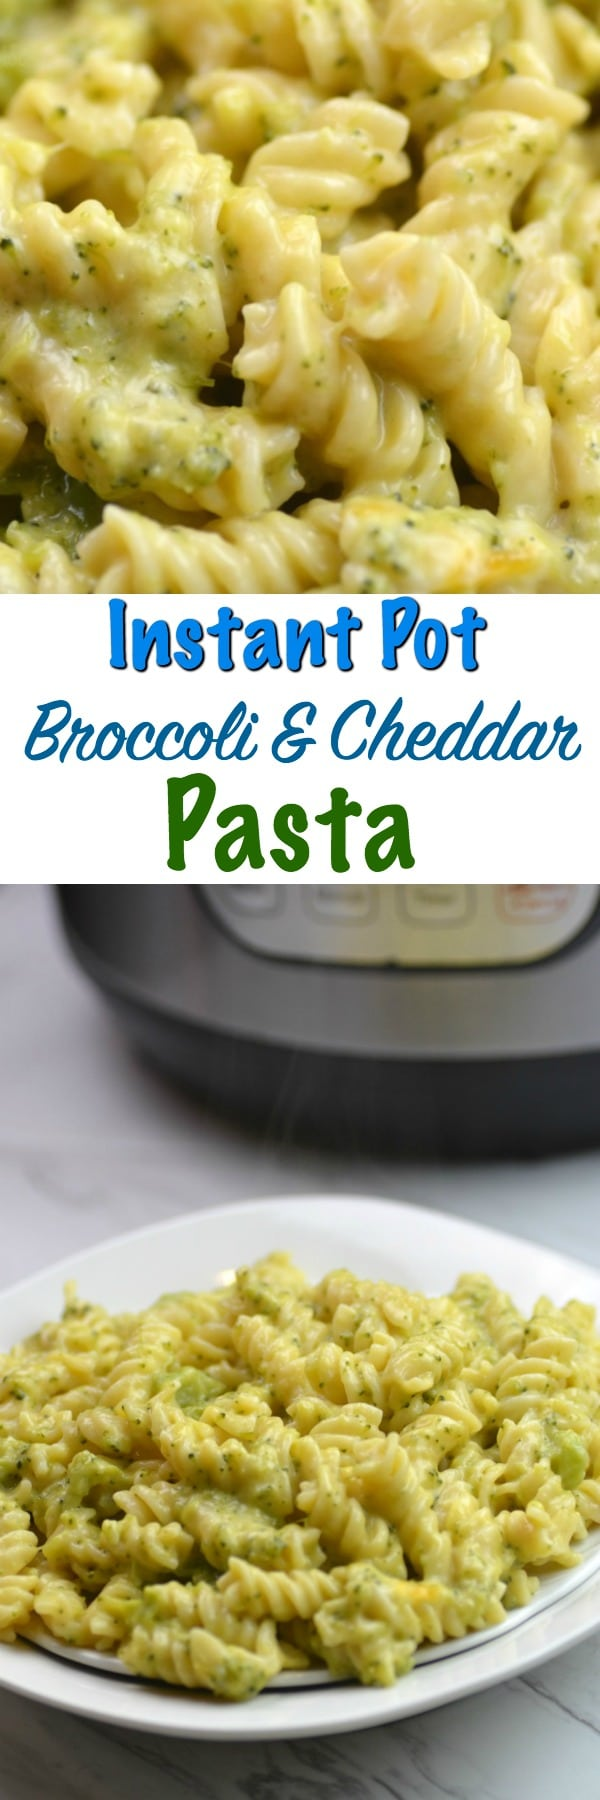 instant pot broccoli  cheddar pasta